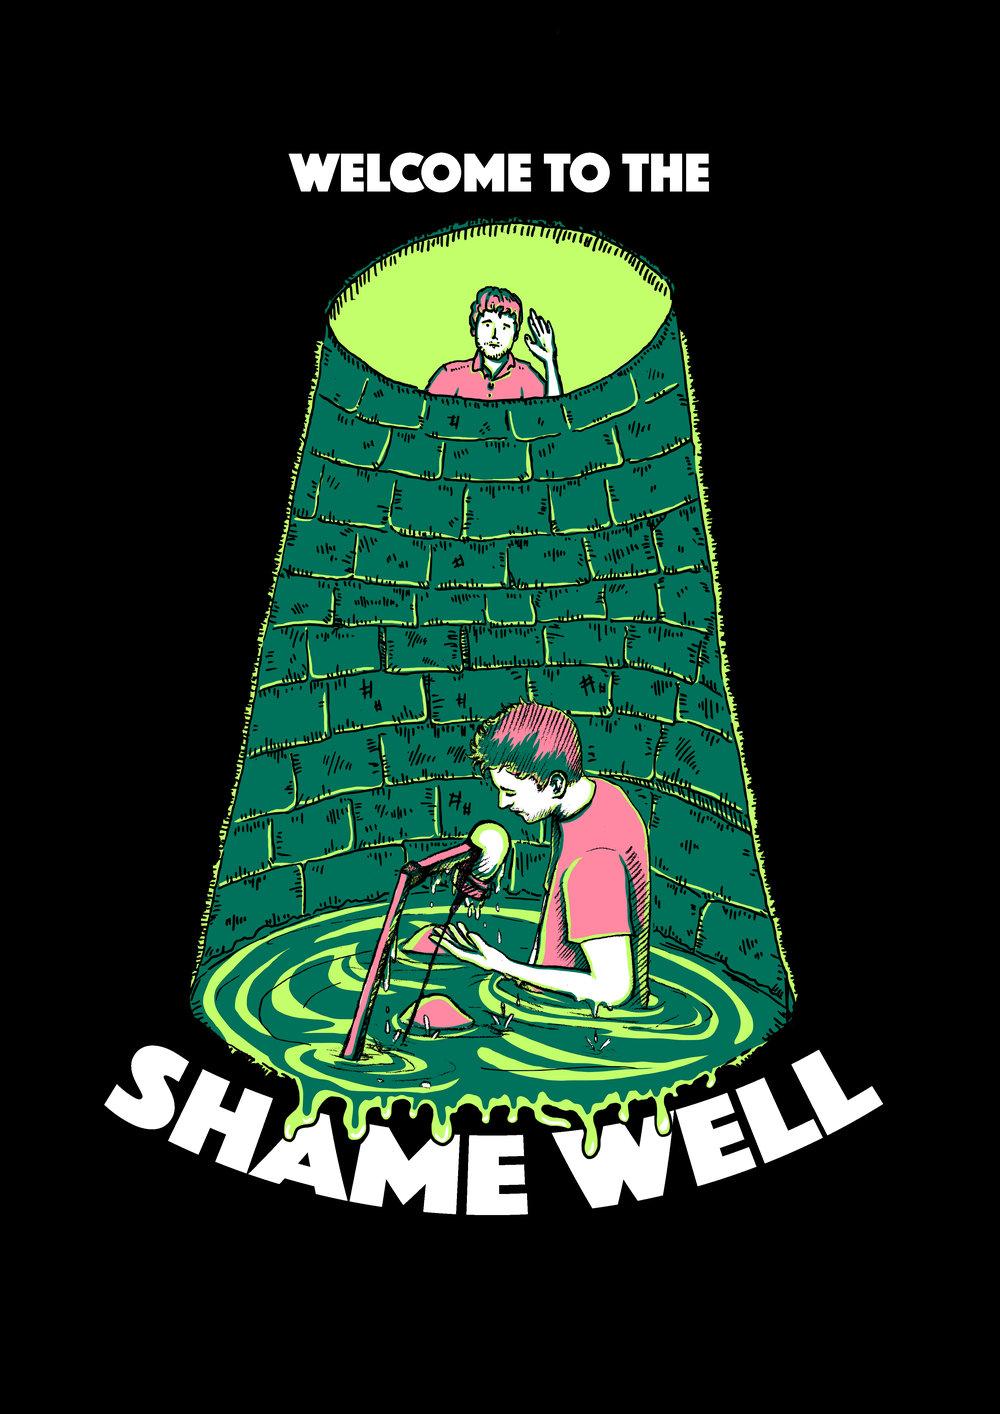 Shame Well print design 2017 (w/Jenny Grene)